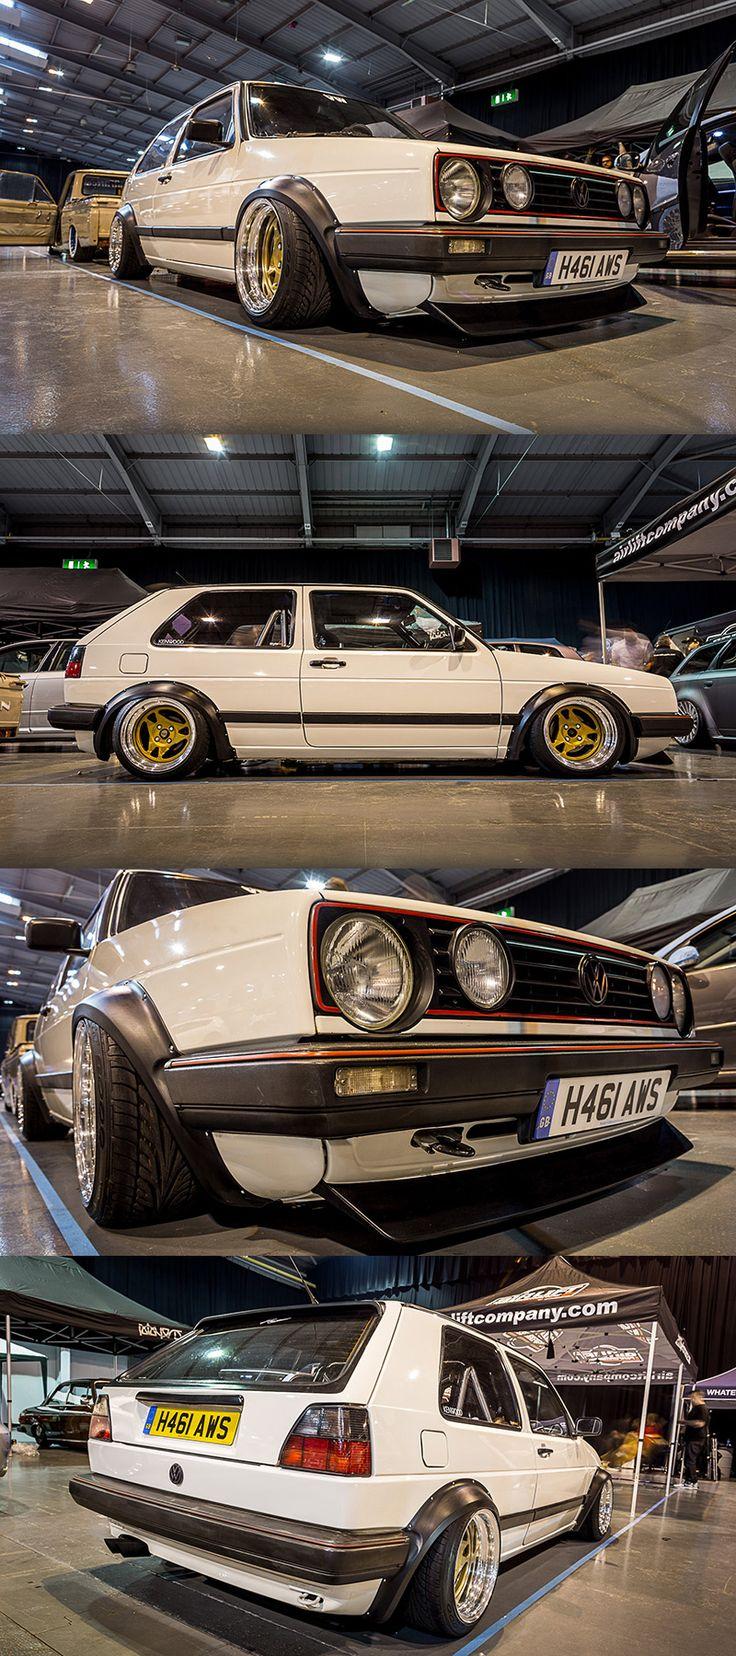 313 best jetta mk2 images on Pinterest | Jetta coupe, Car interiors ...